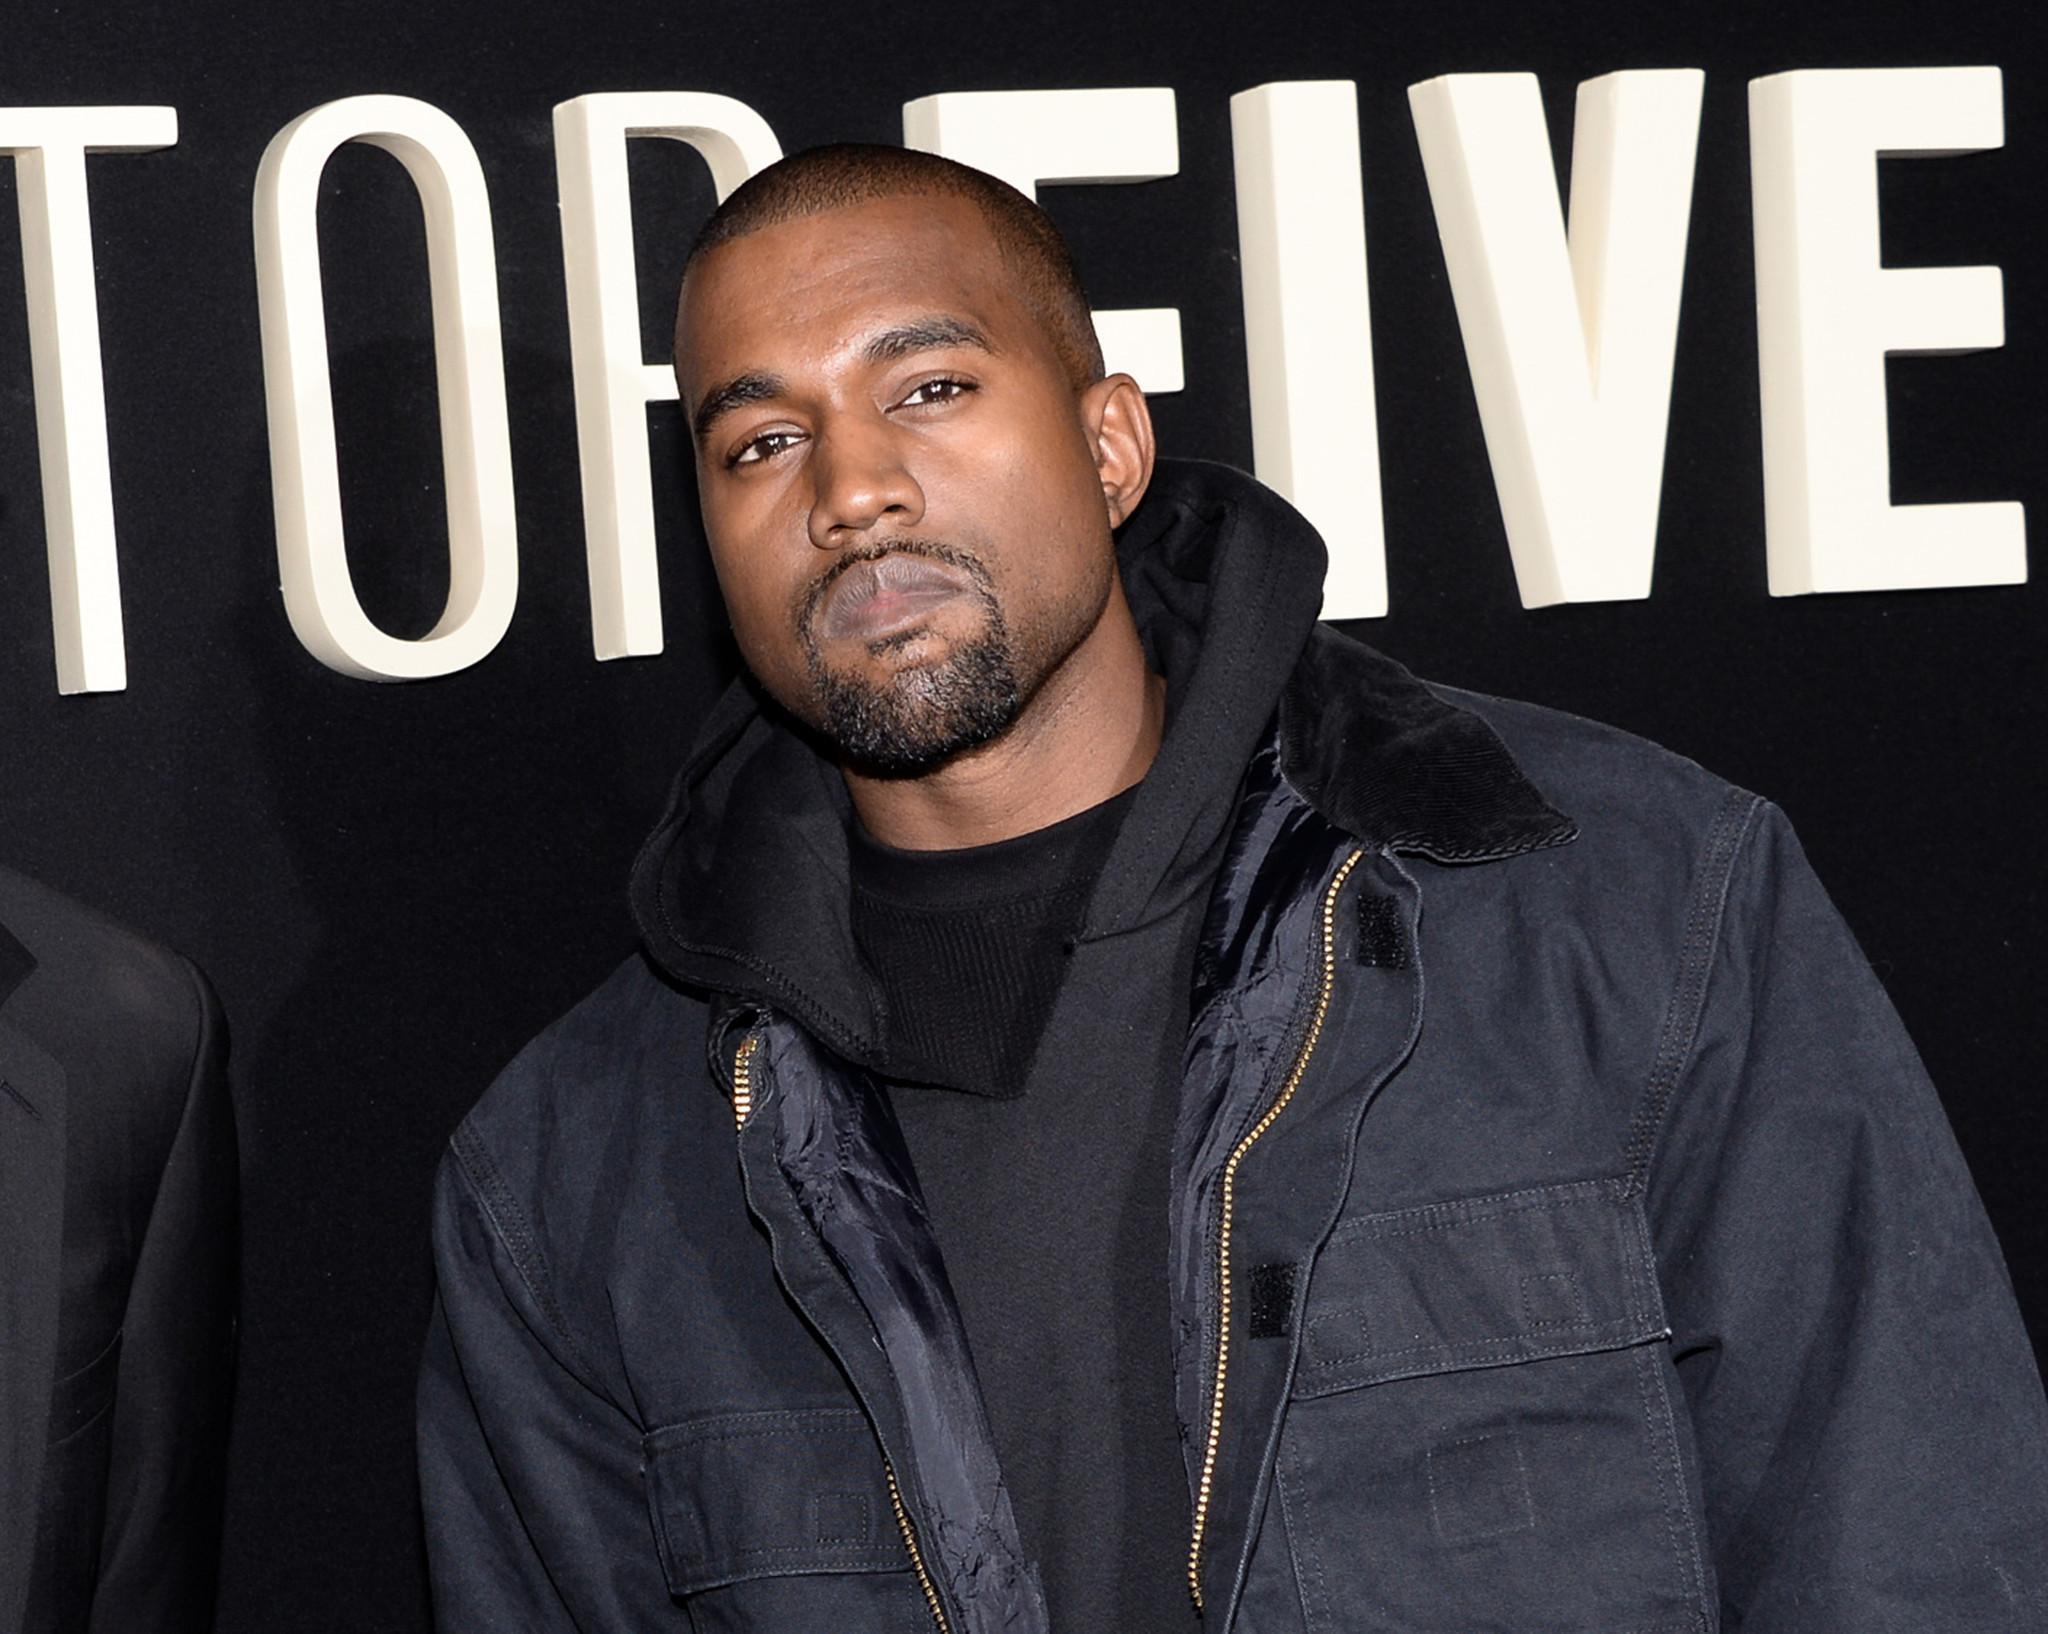 Kanye West rolls back diss of Beck, calls Grammys a joke - Chicago ...